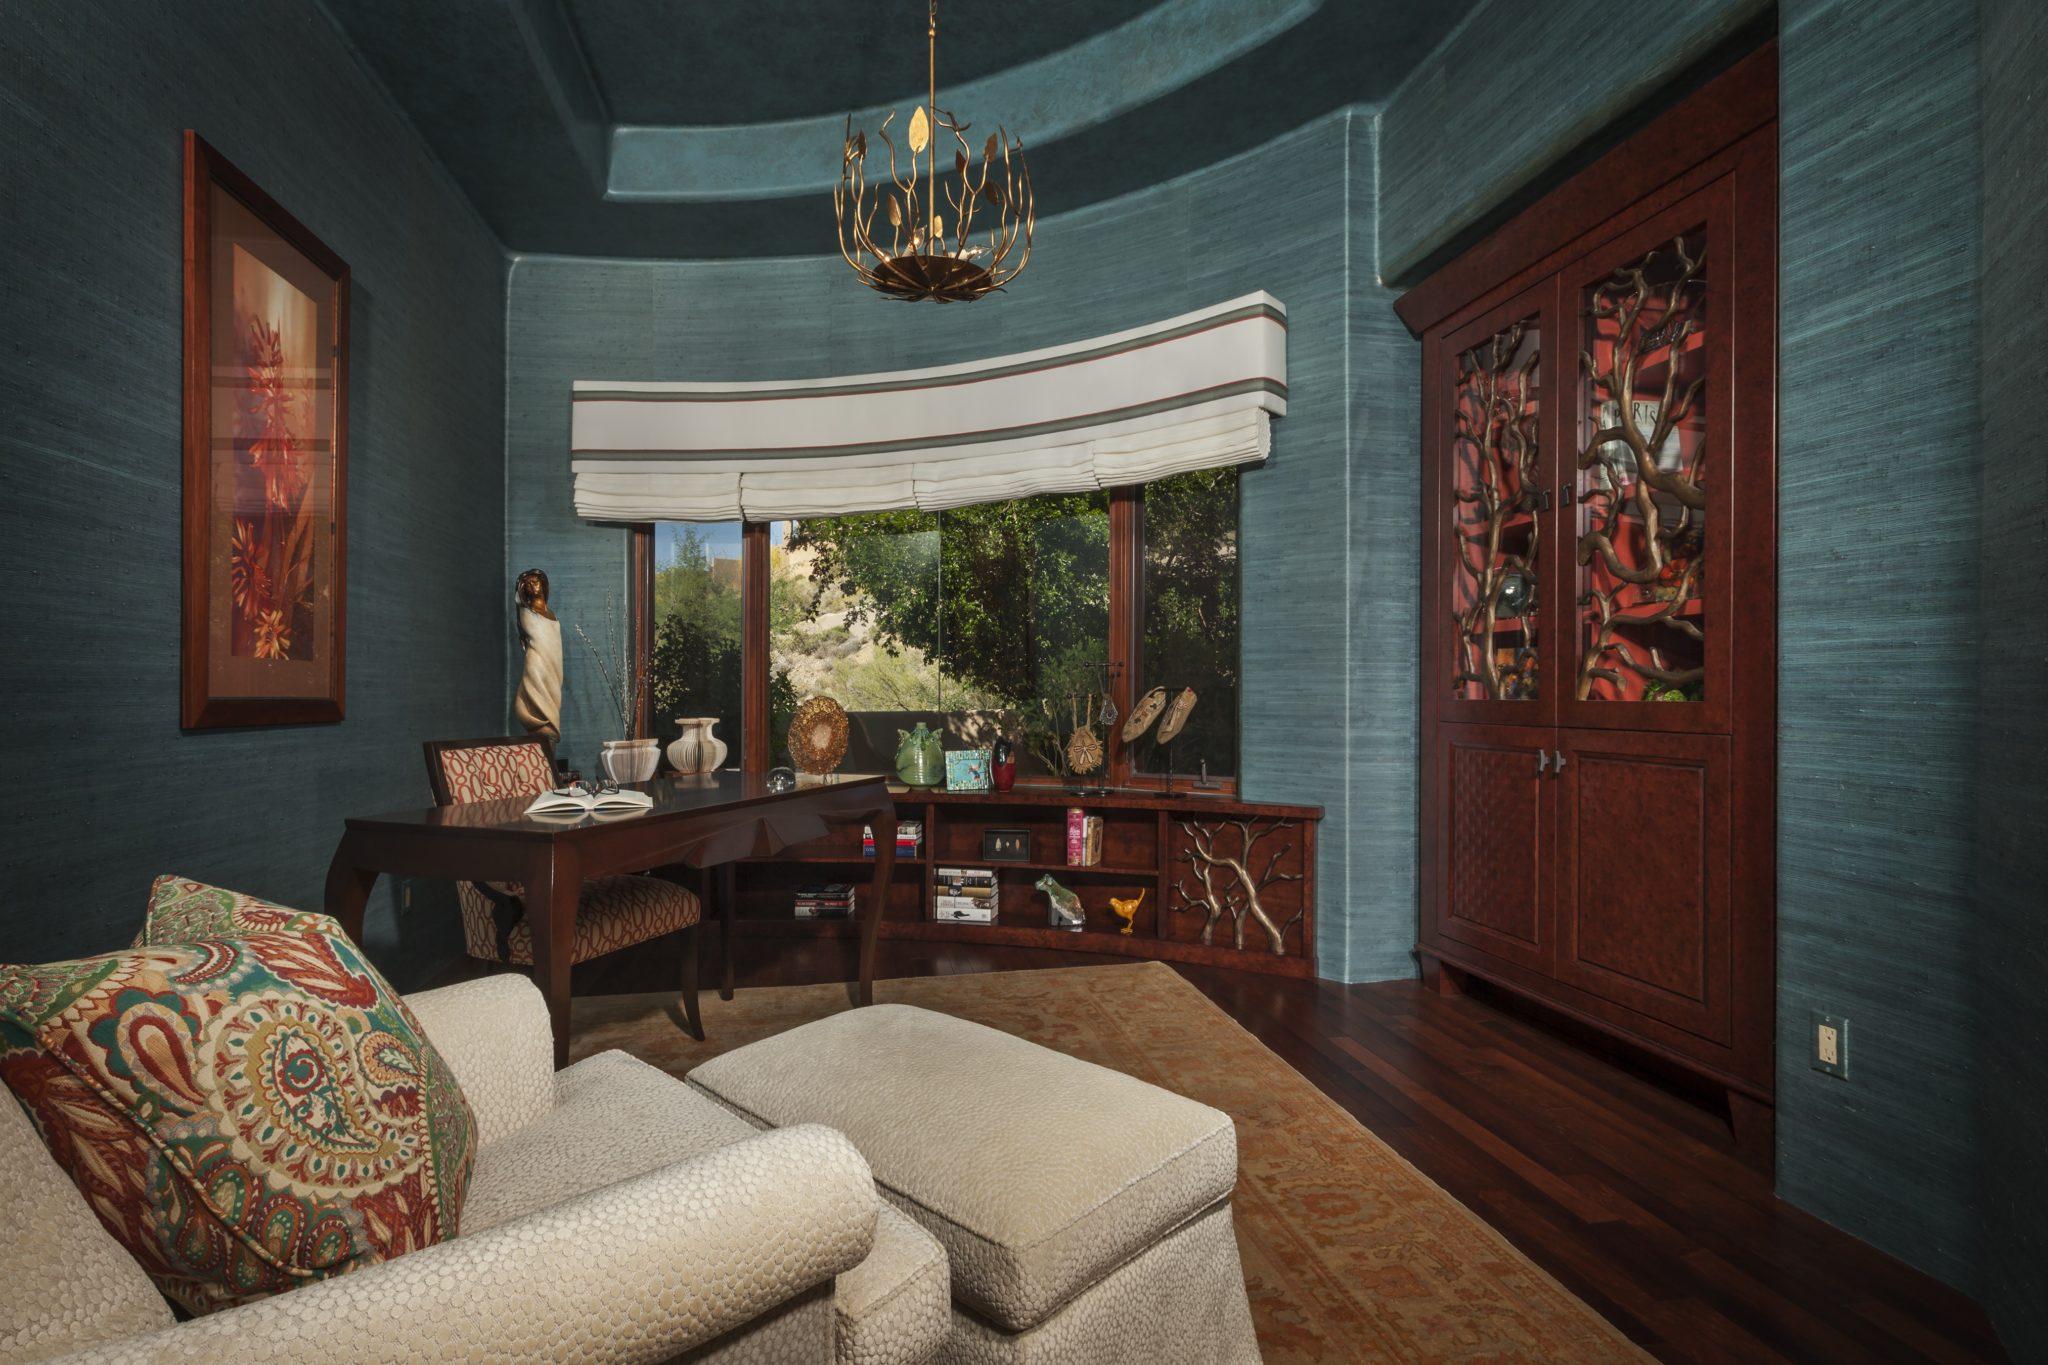 Desert Mountain home office with organic elements - Scottsdale, Arizona. By Sesshu Design Associates